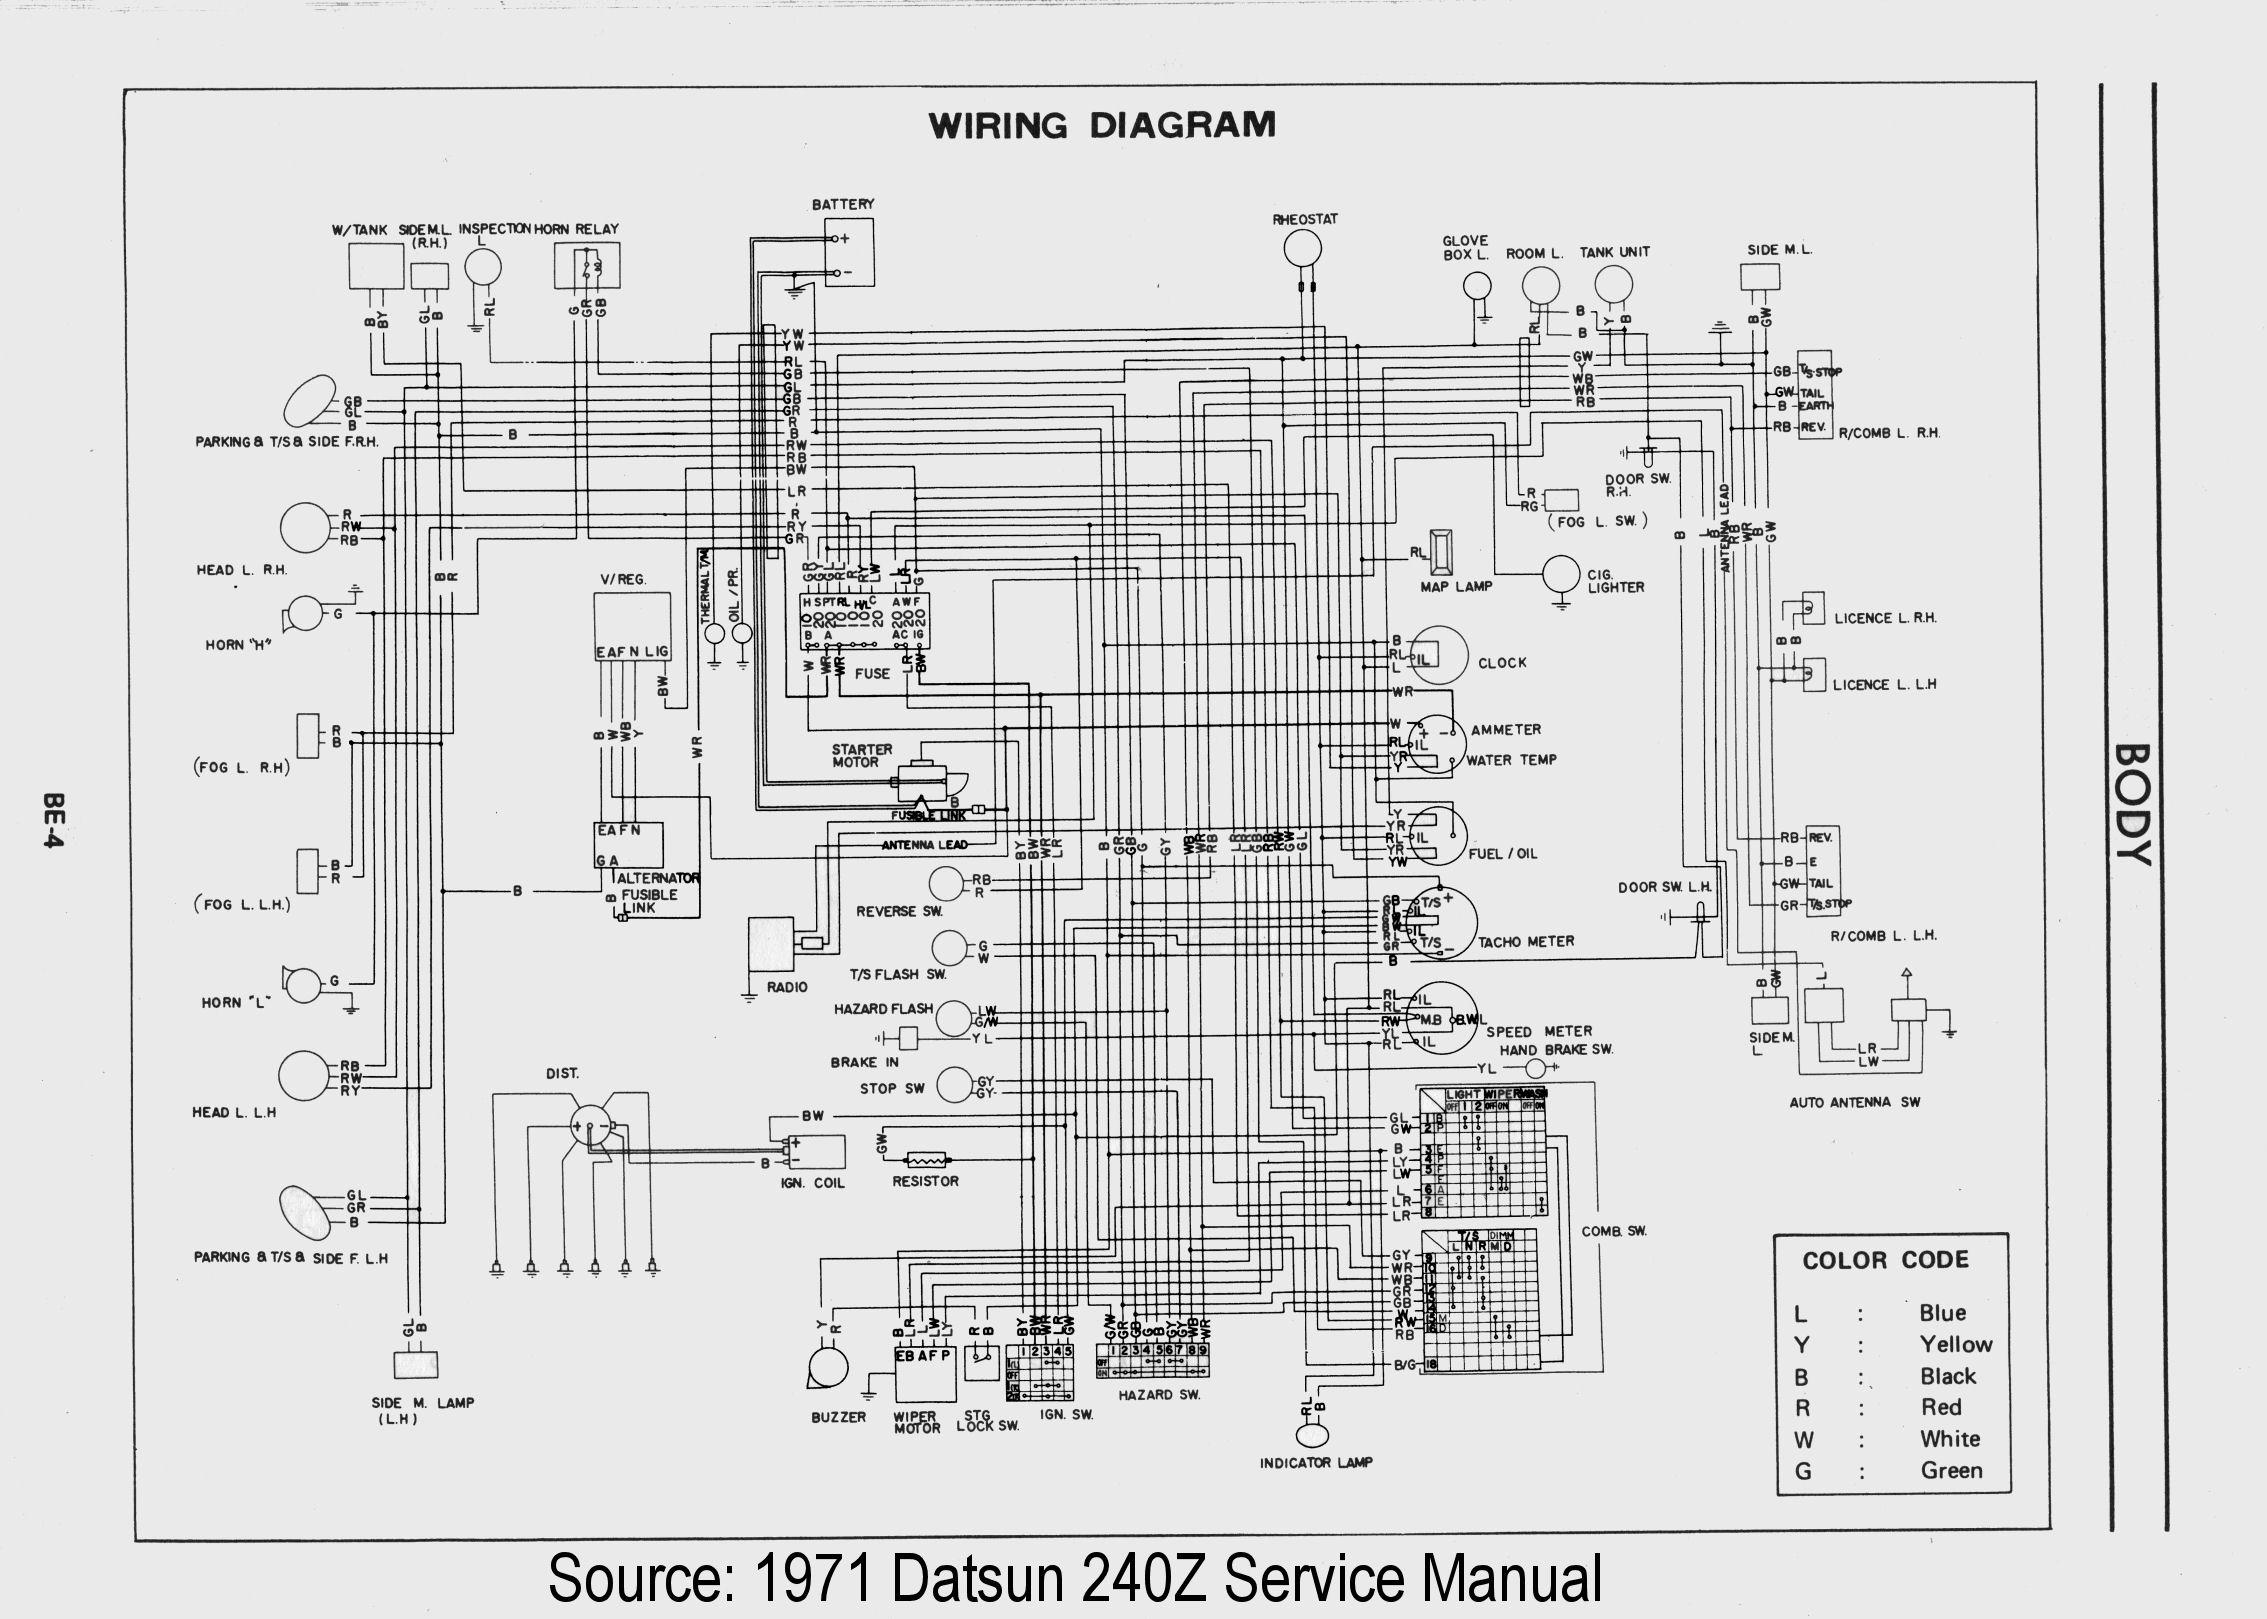 Datsun 240z Wiring Harness